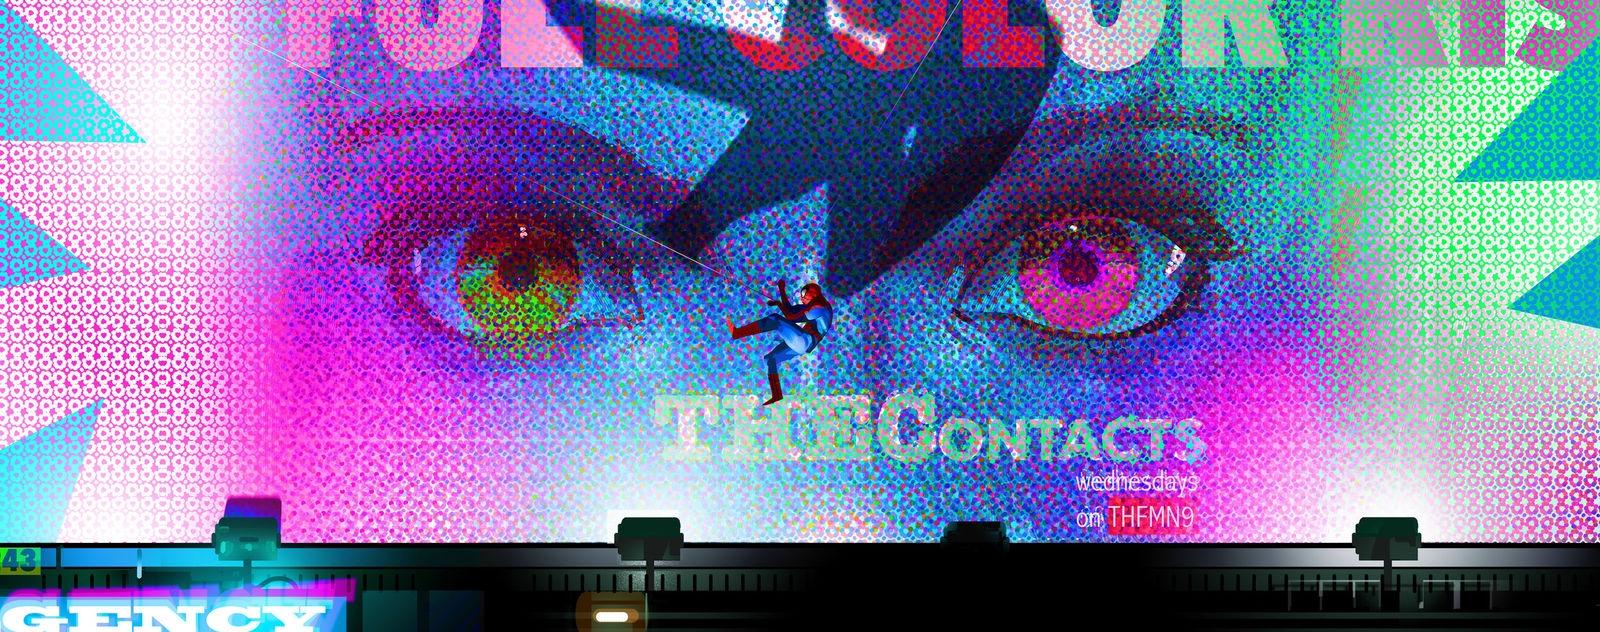 Spider-Man: Into the Spider-Verse Concept Art by Alberto Mielgo